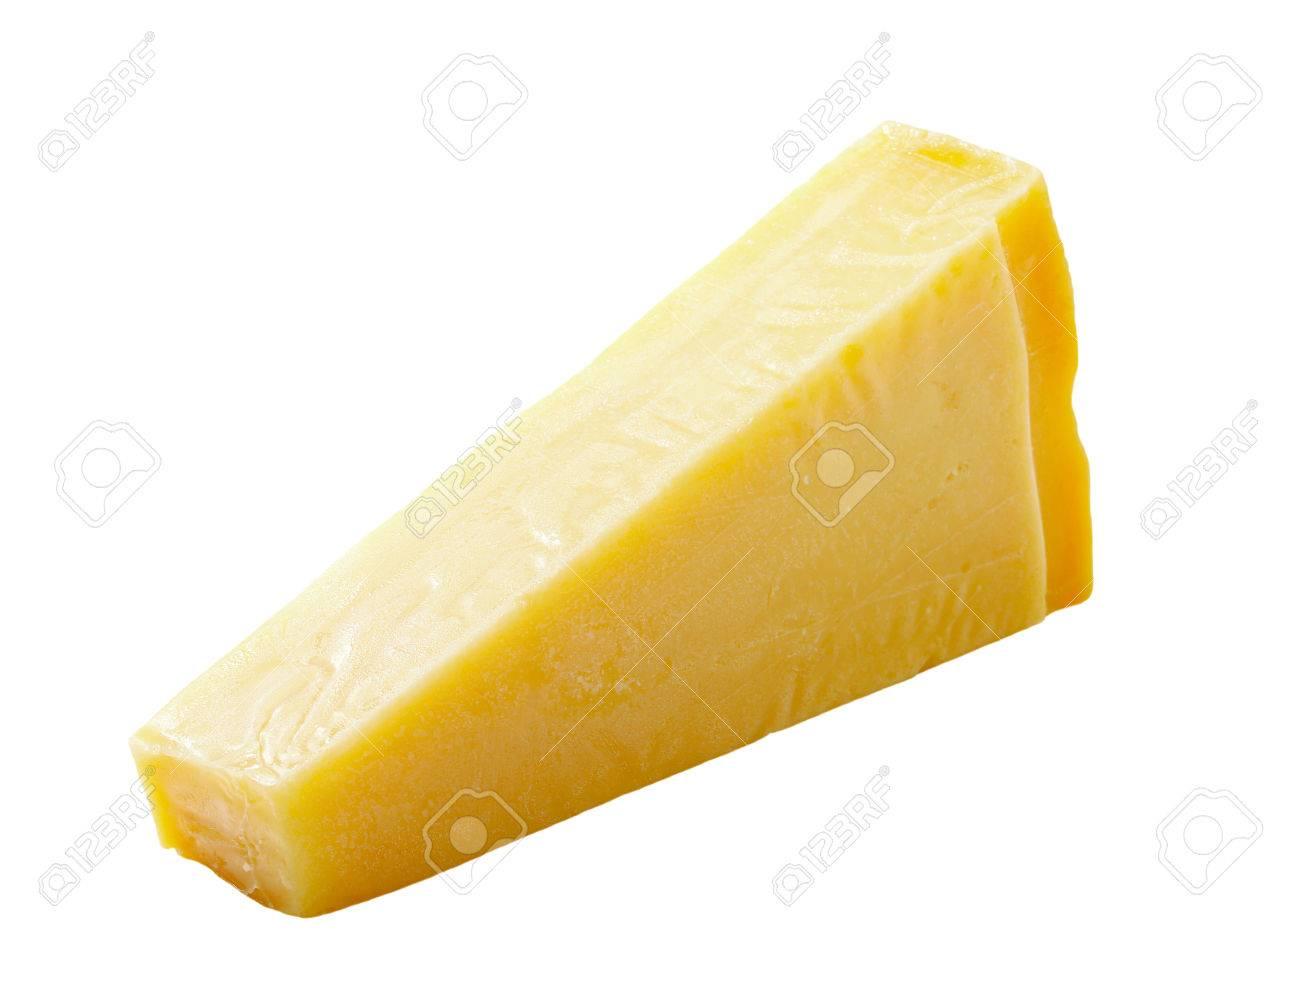 Wedge of Italian hard cheese